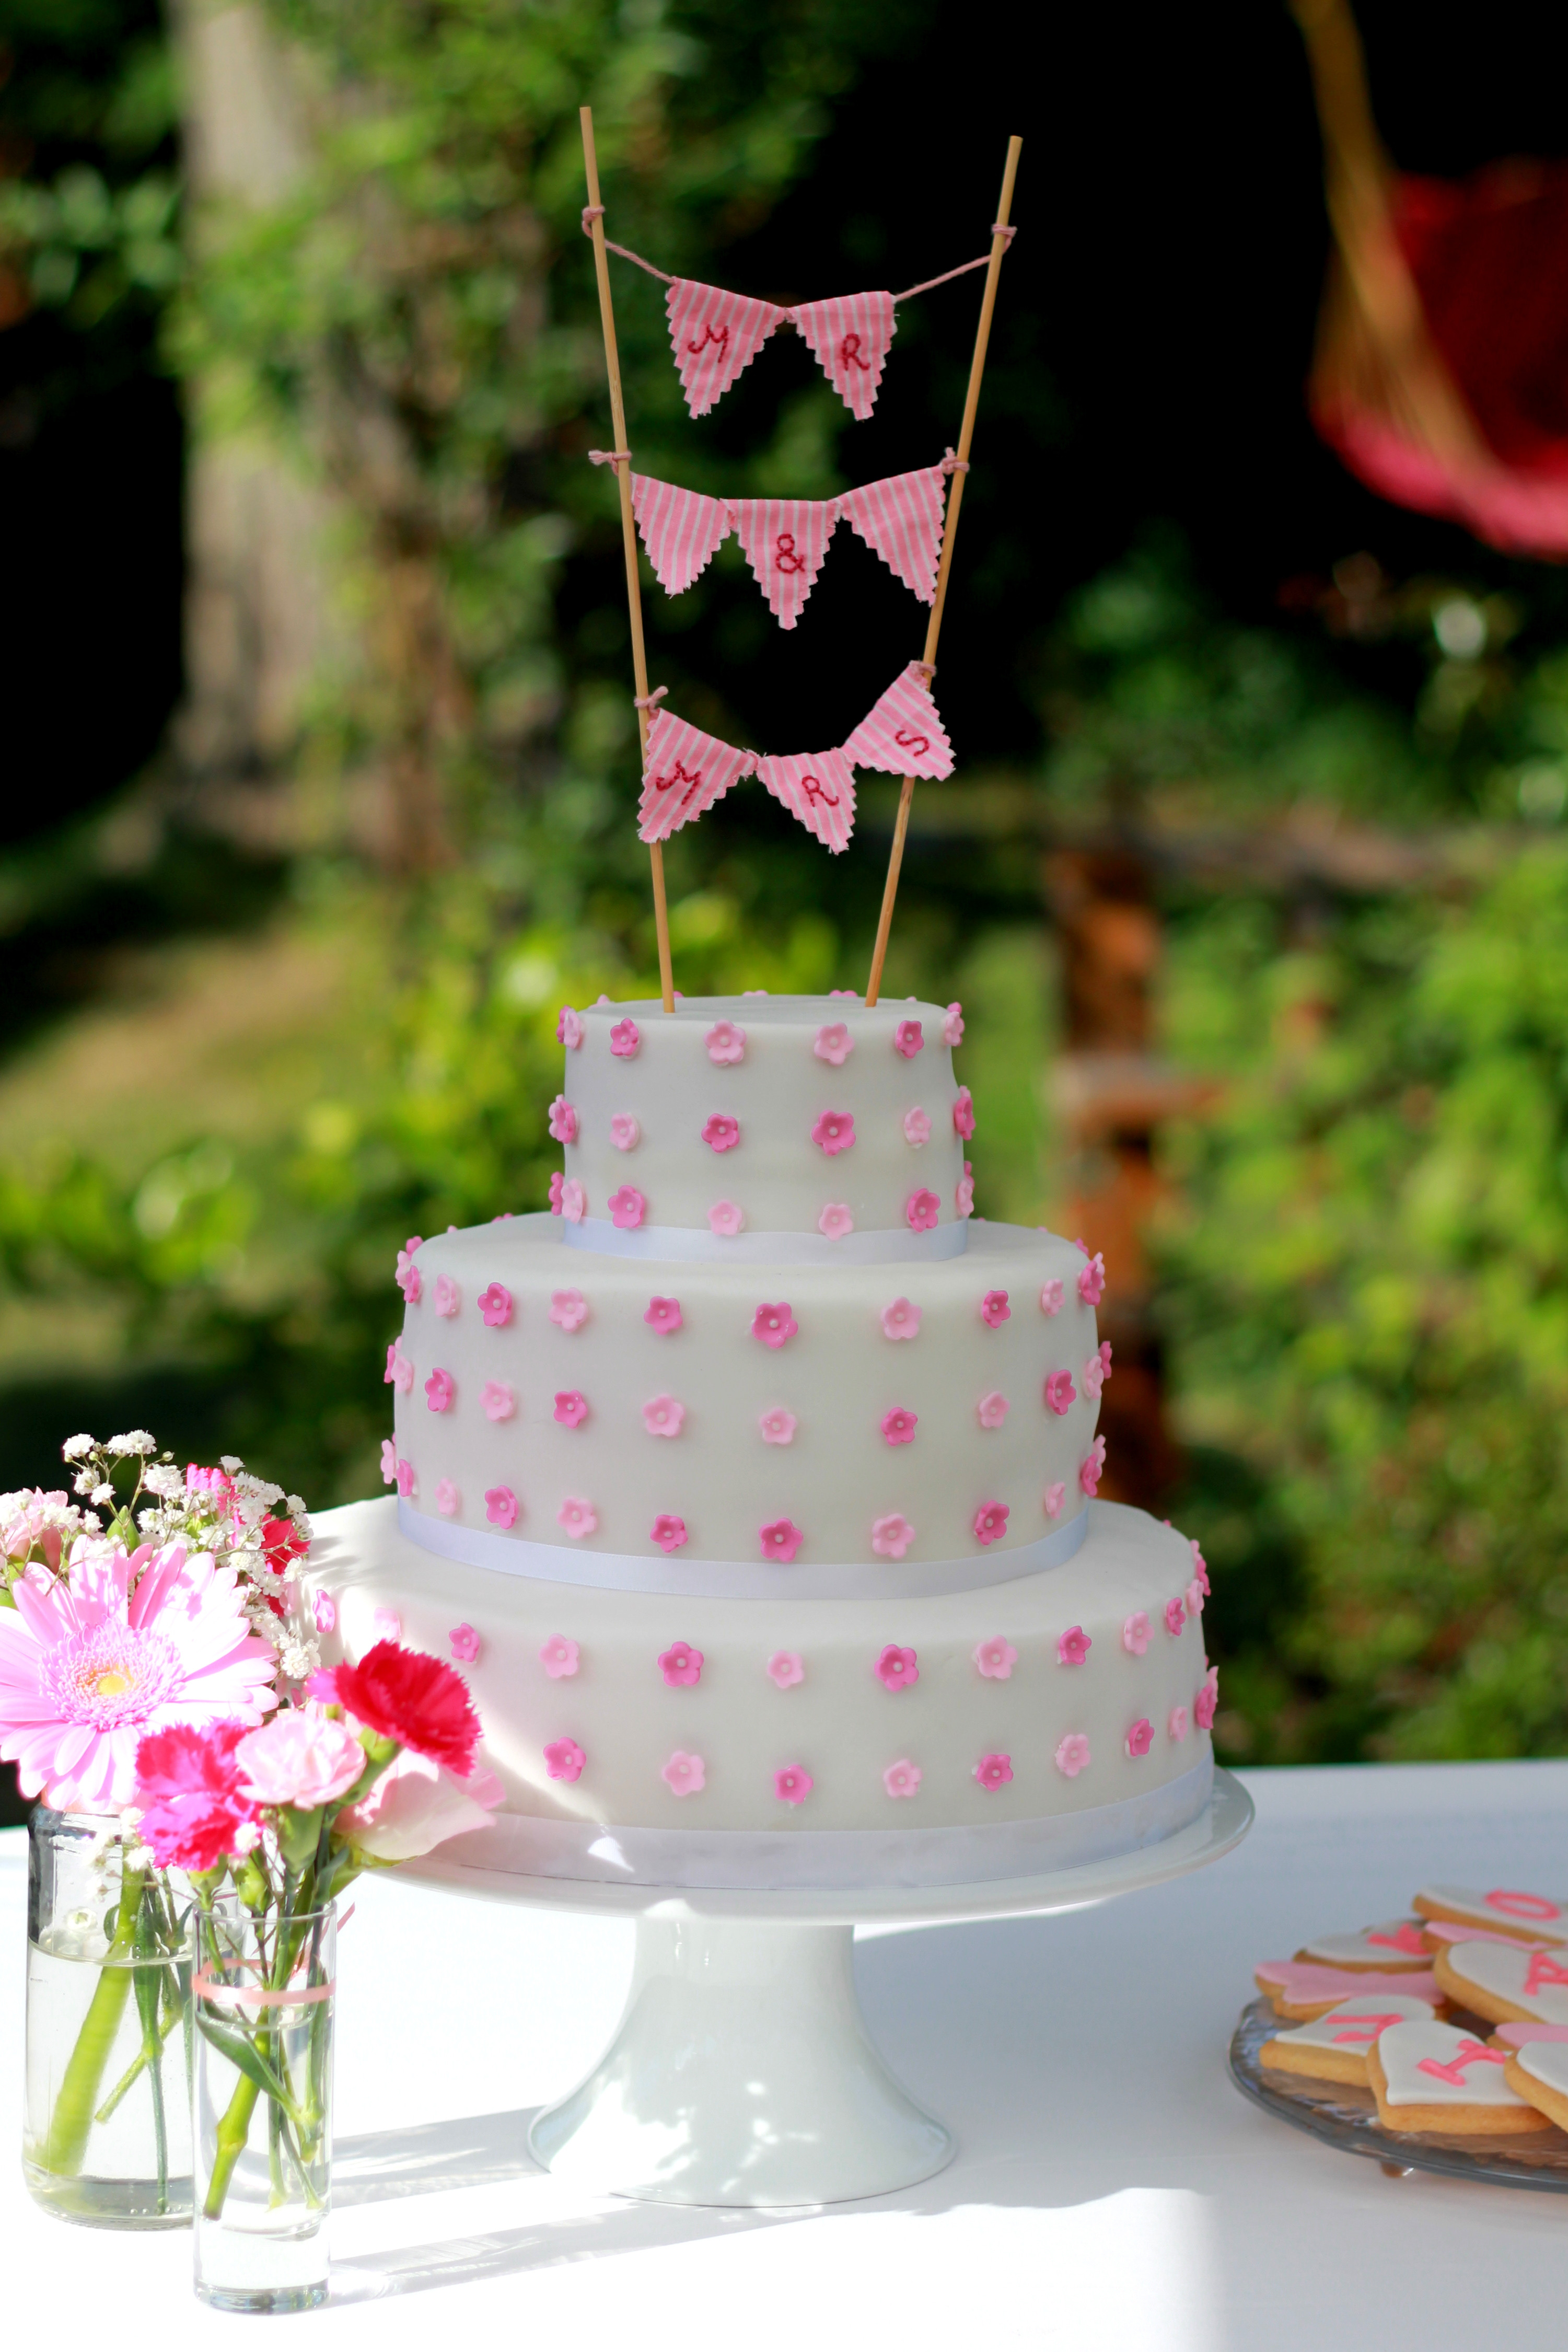 Easy Wedding Cakes To Make Yourself  DIY Wedding Cake Tutorial